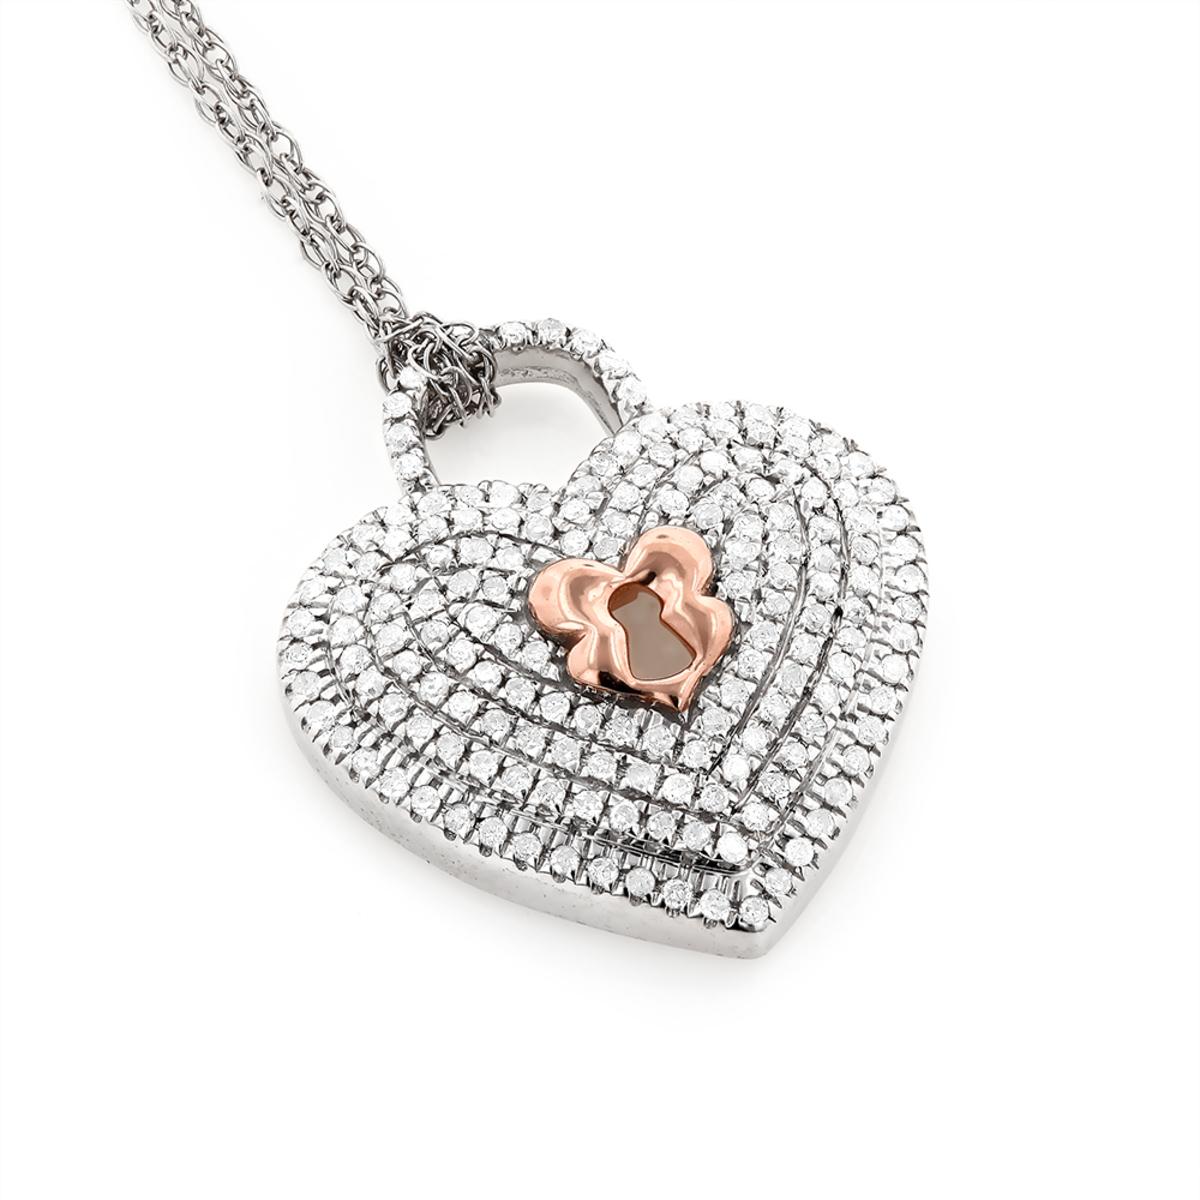 Micro Pave Diamond Heart Pendant Necklace 0.25ct 10K Gold